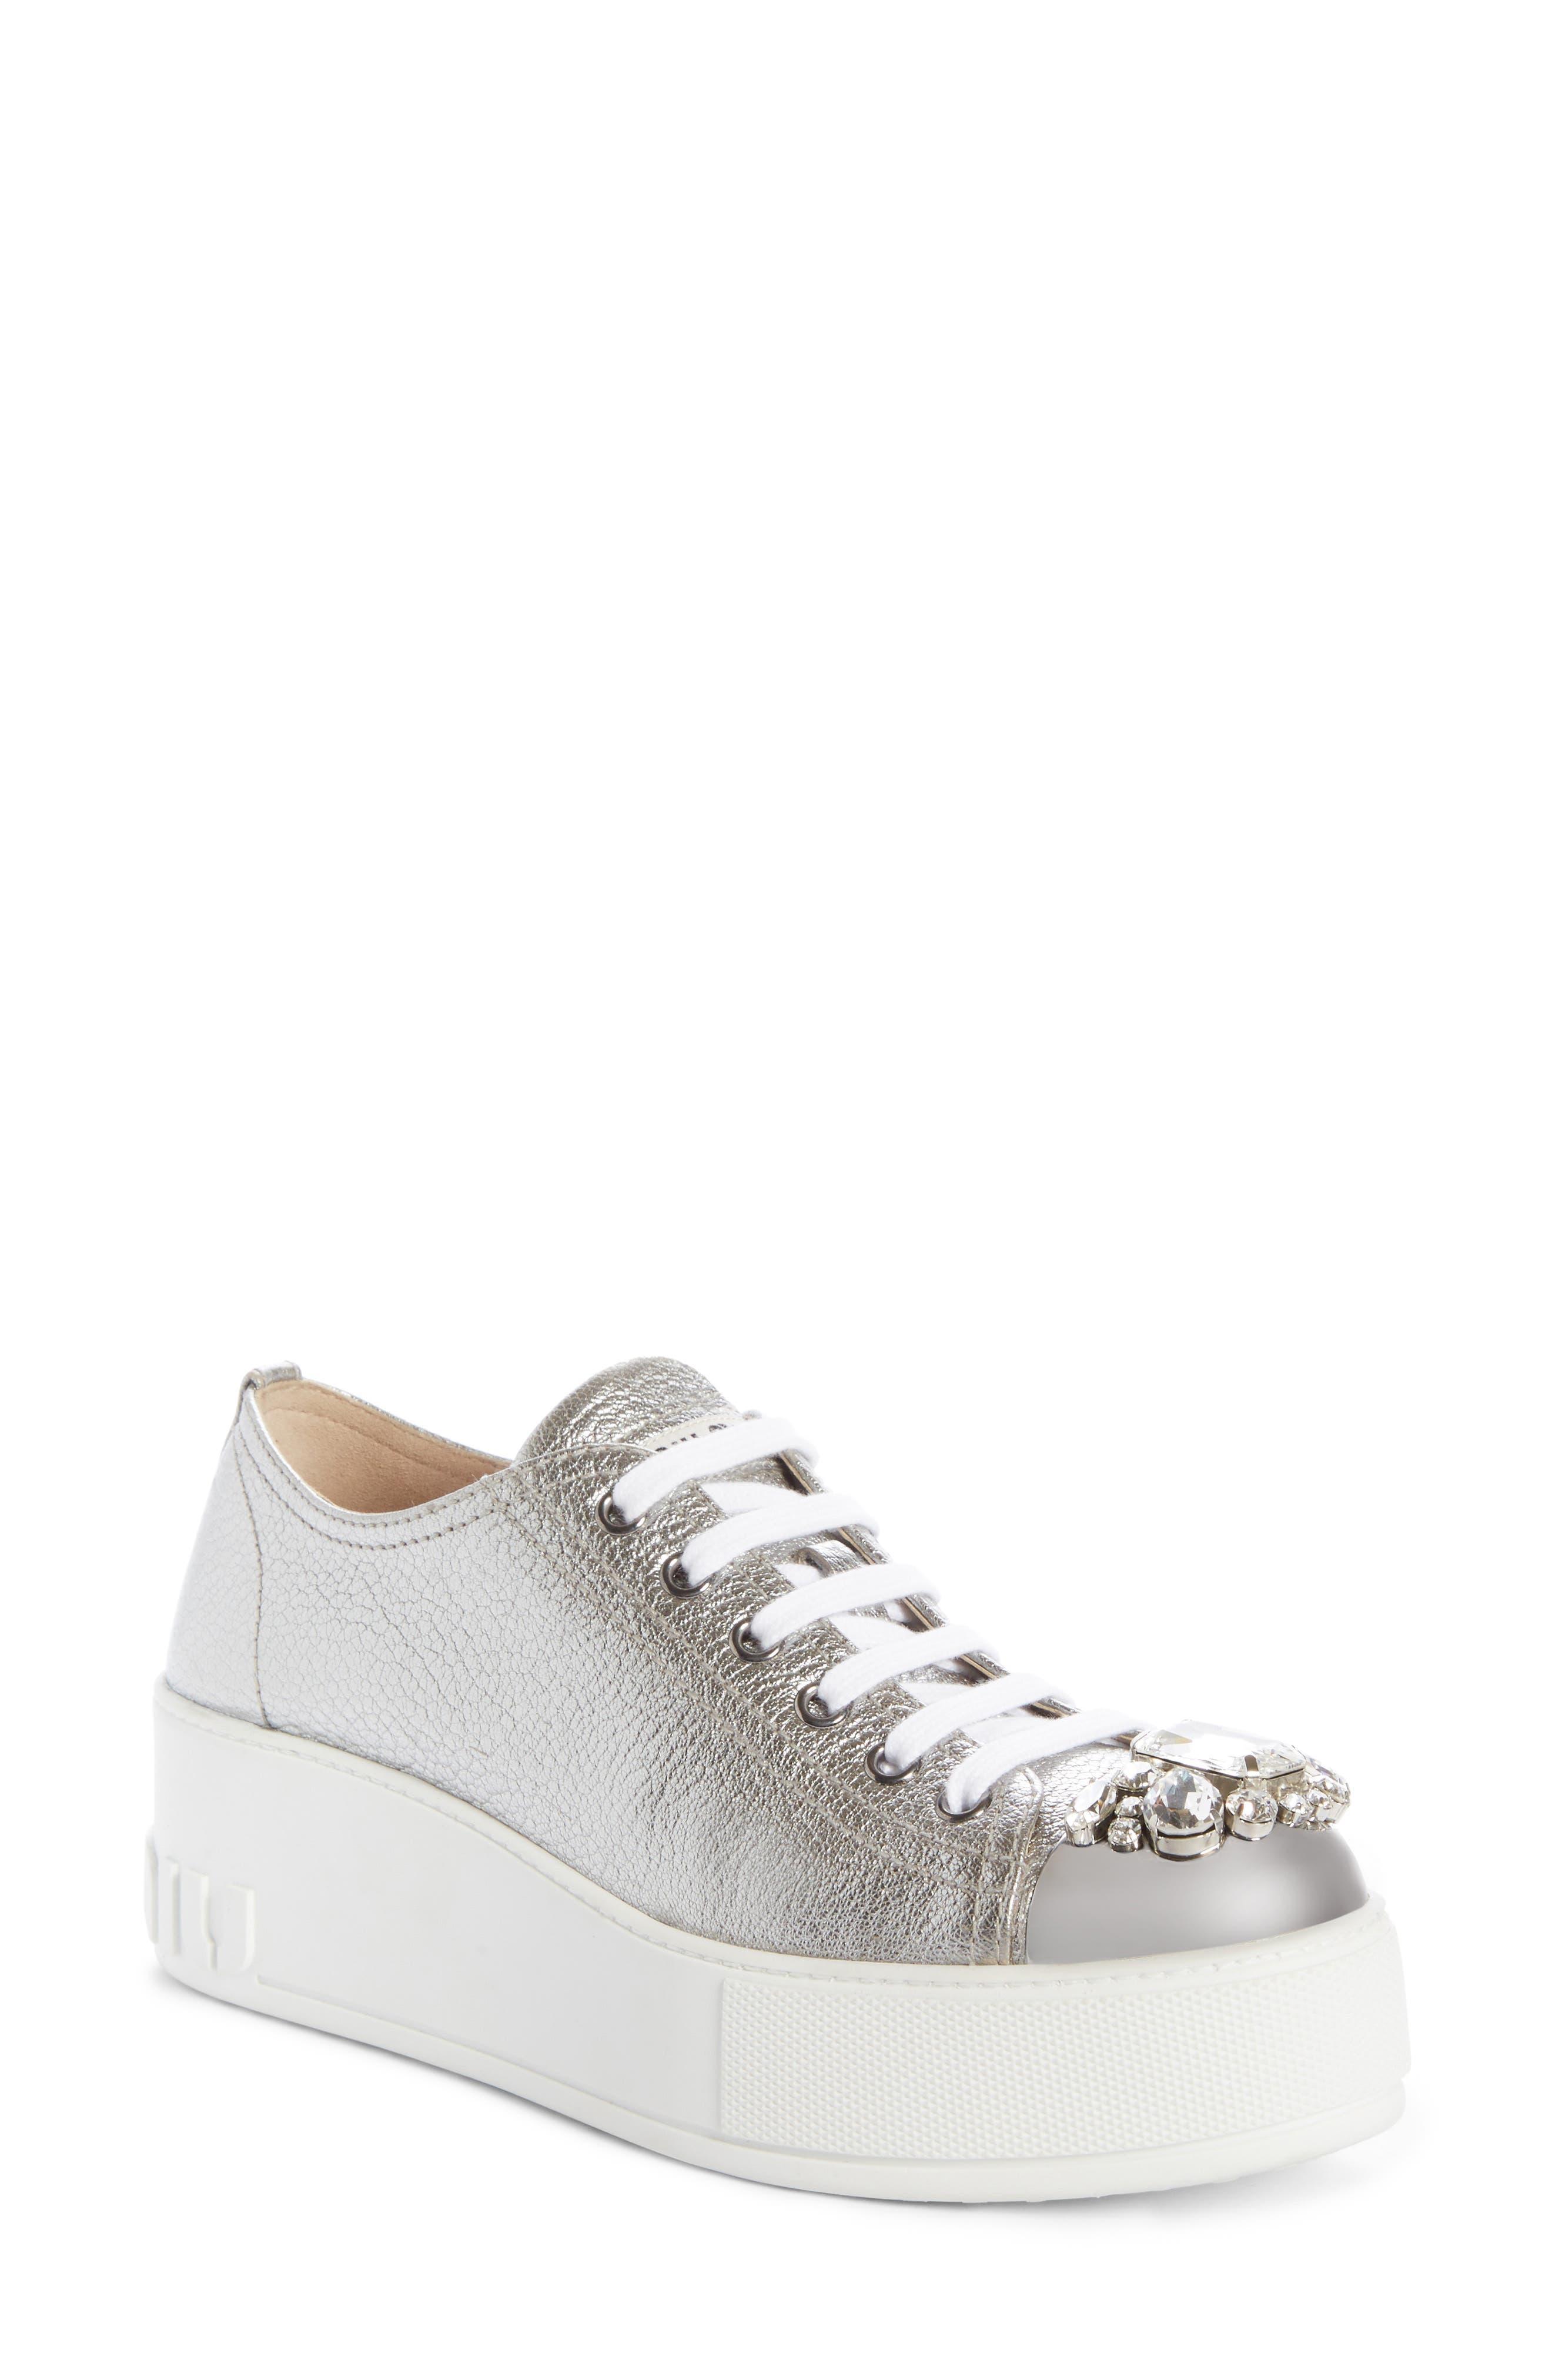 Crystal Cap Toe Sneaker,                             Main thumbnail 1, color,                             SILVER